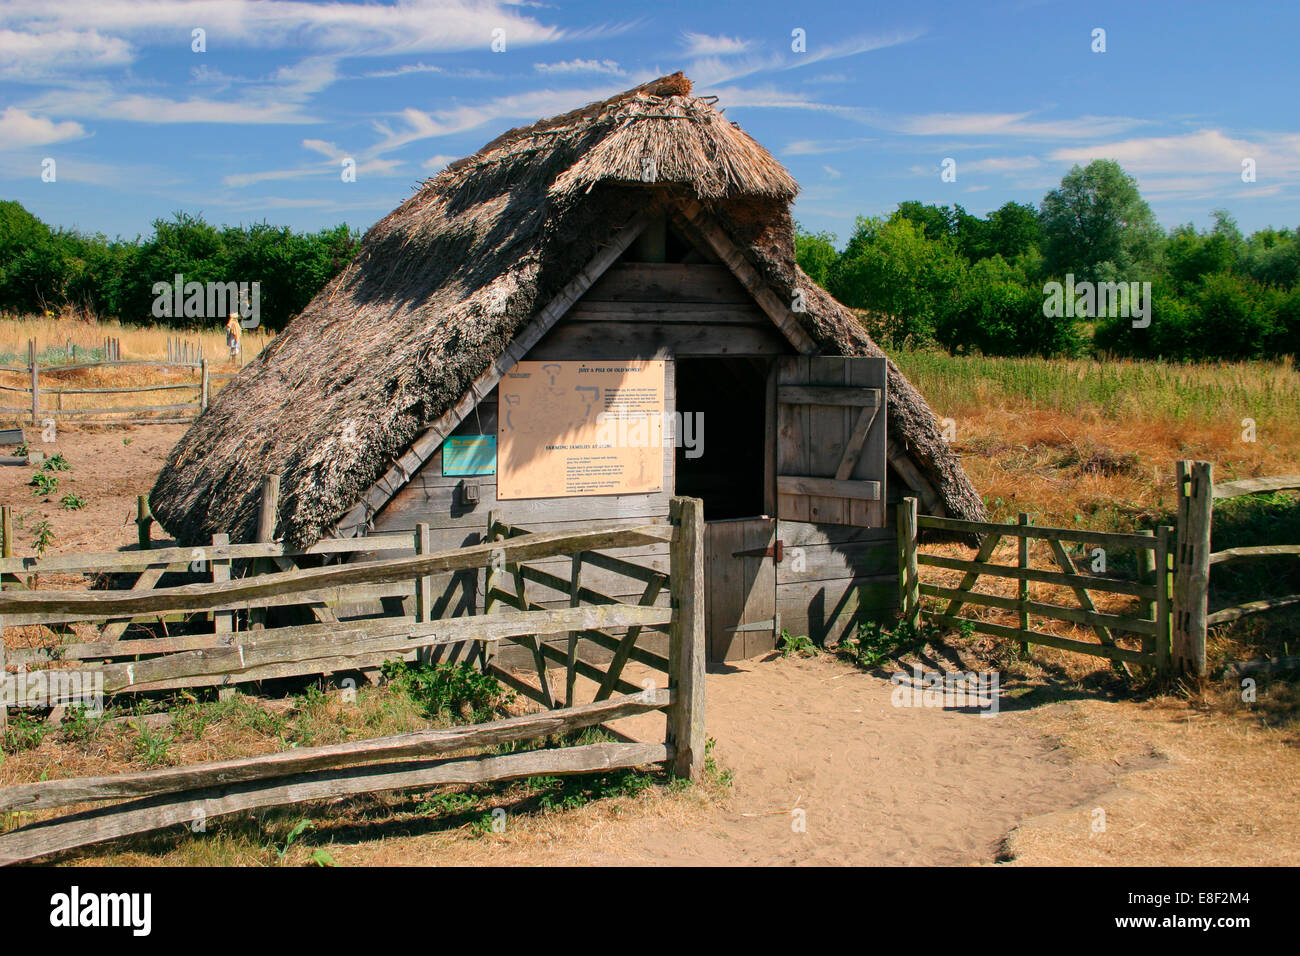 Anglo Saxon Life High Resolution Stock Photography And Images Alamy